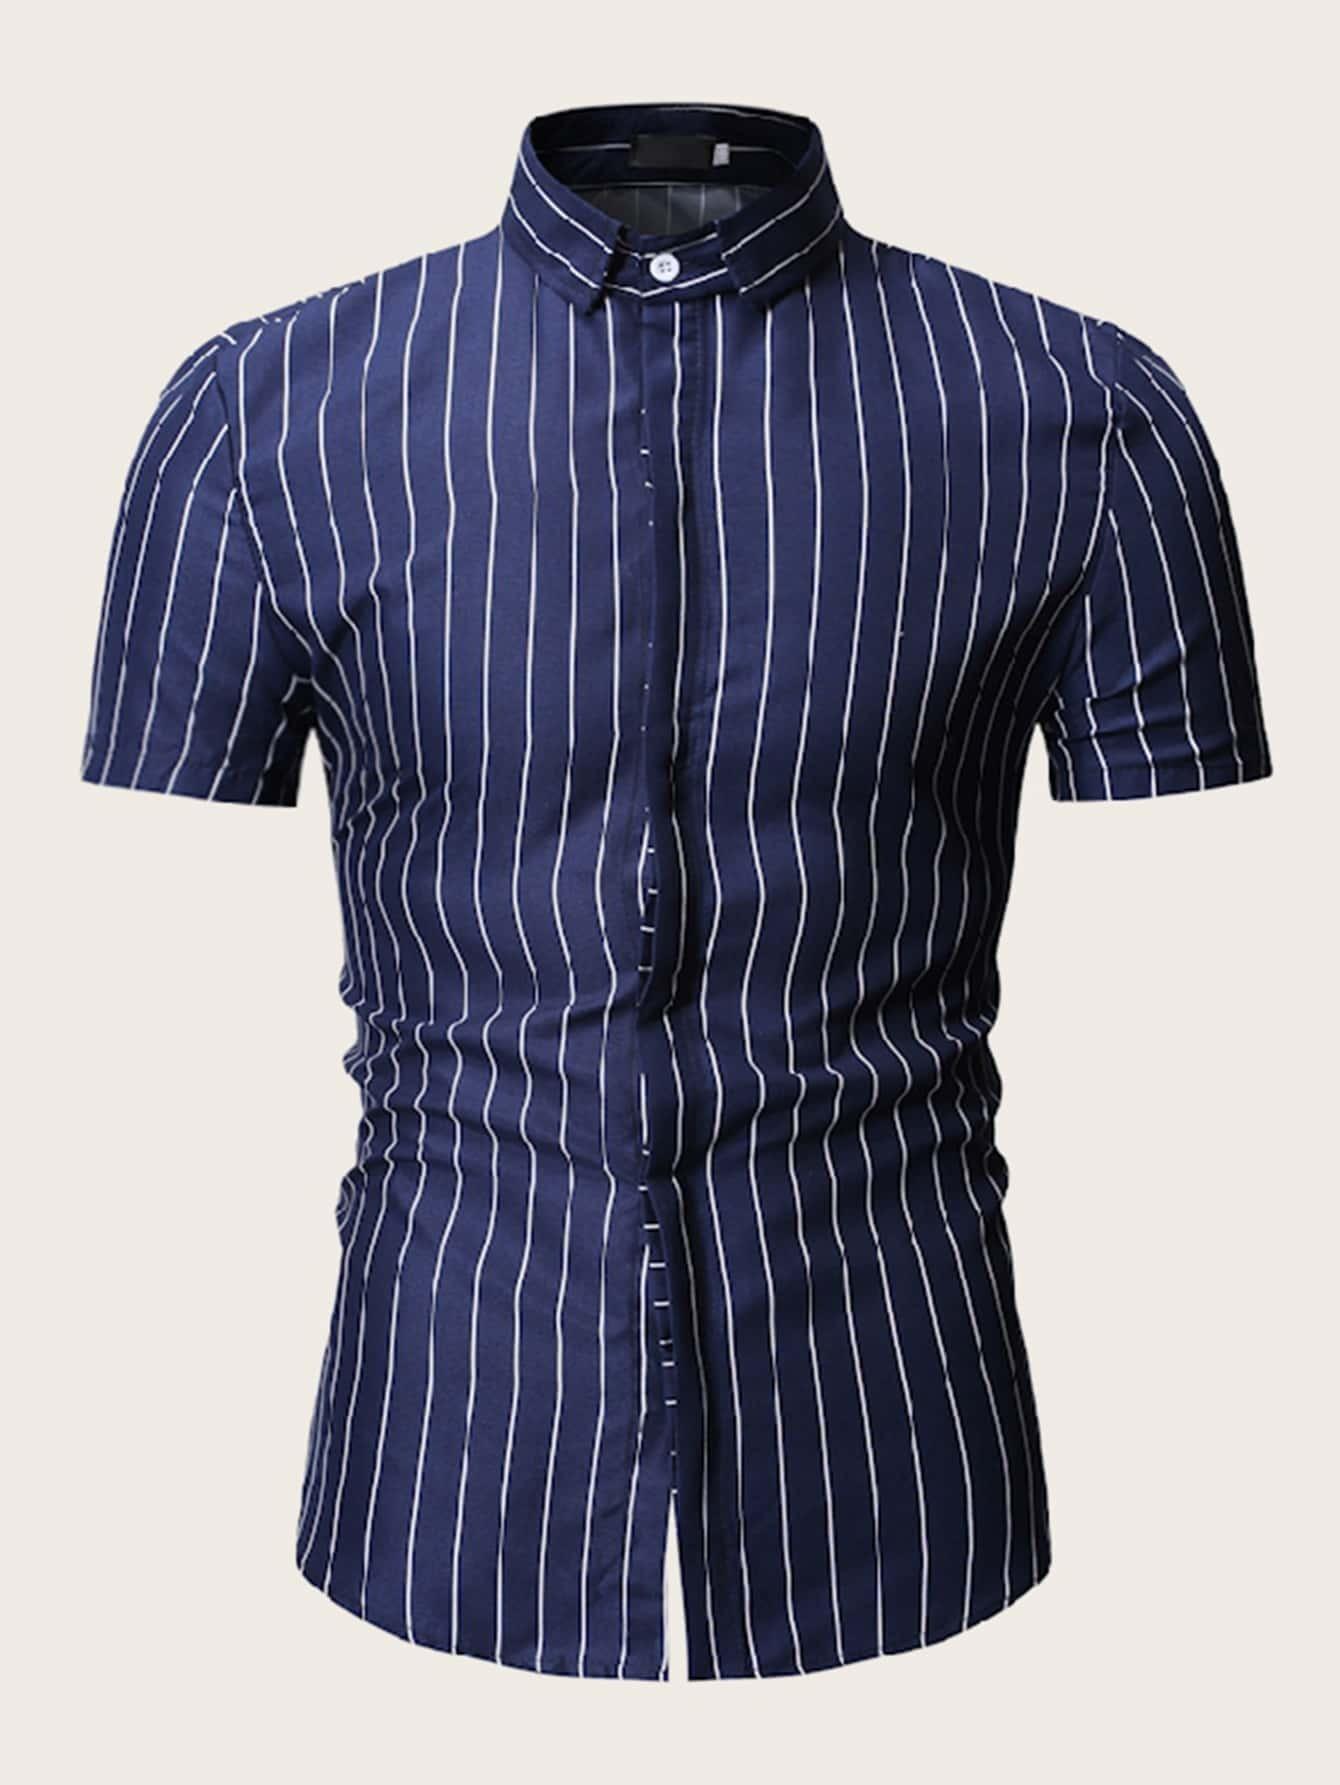 Фото - Мужская полосатая рубашка от SheIn цвет темно синий